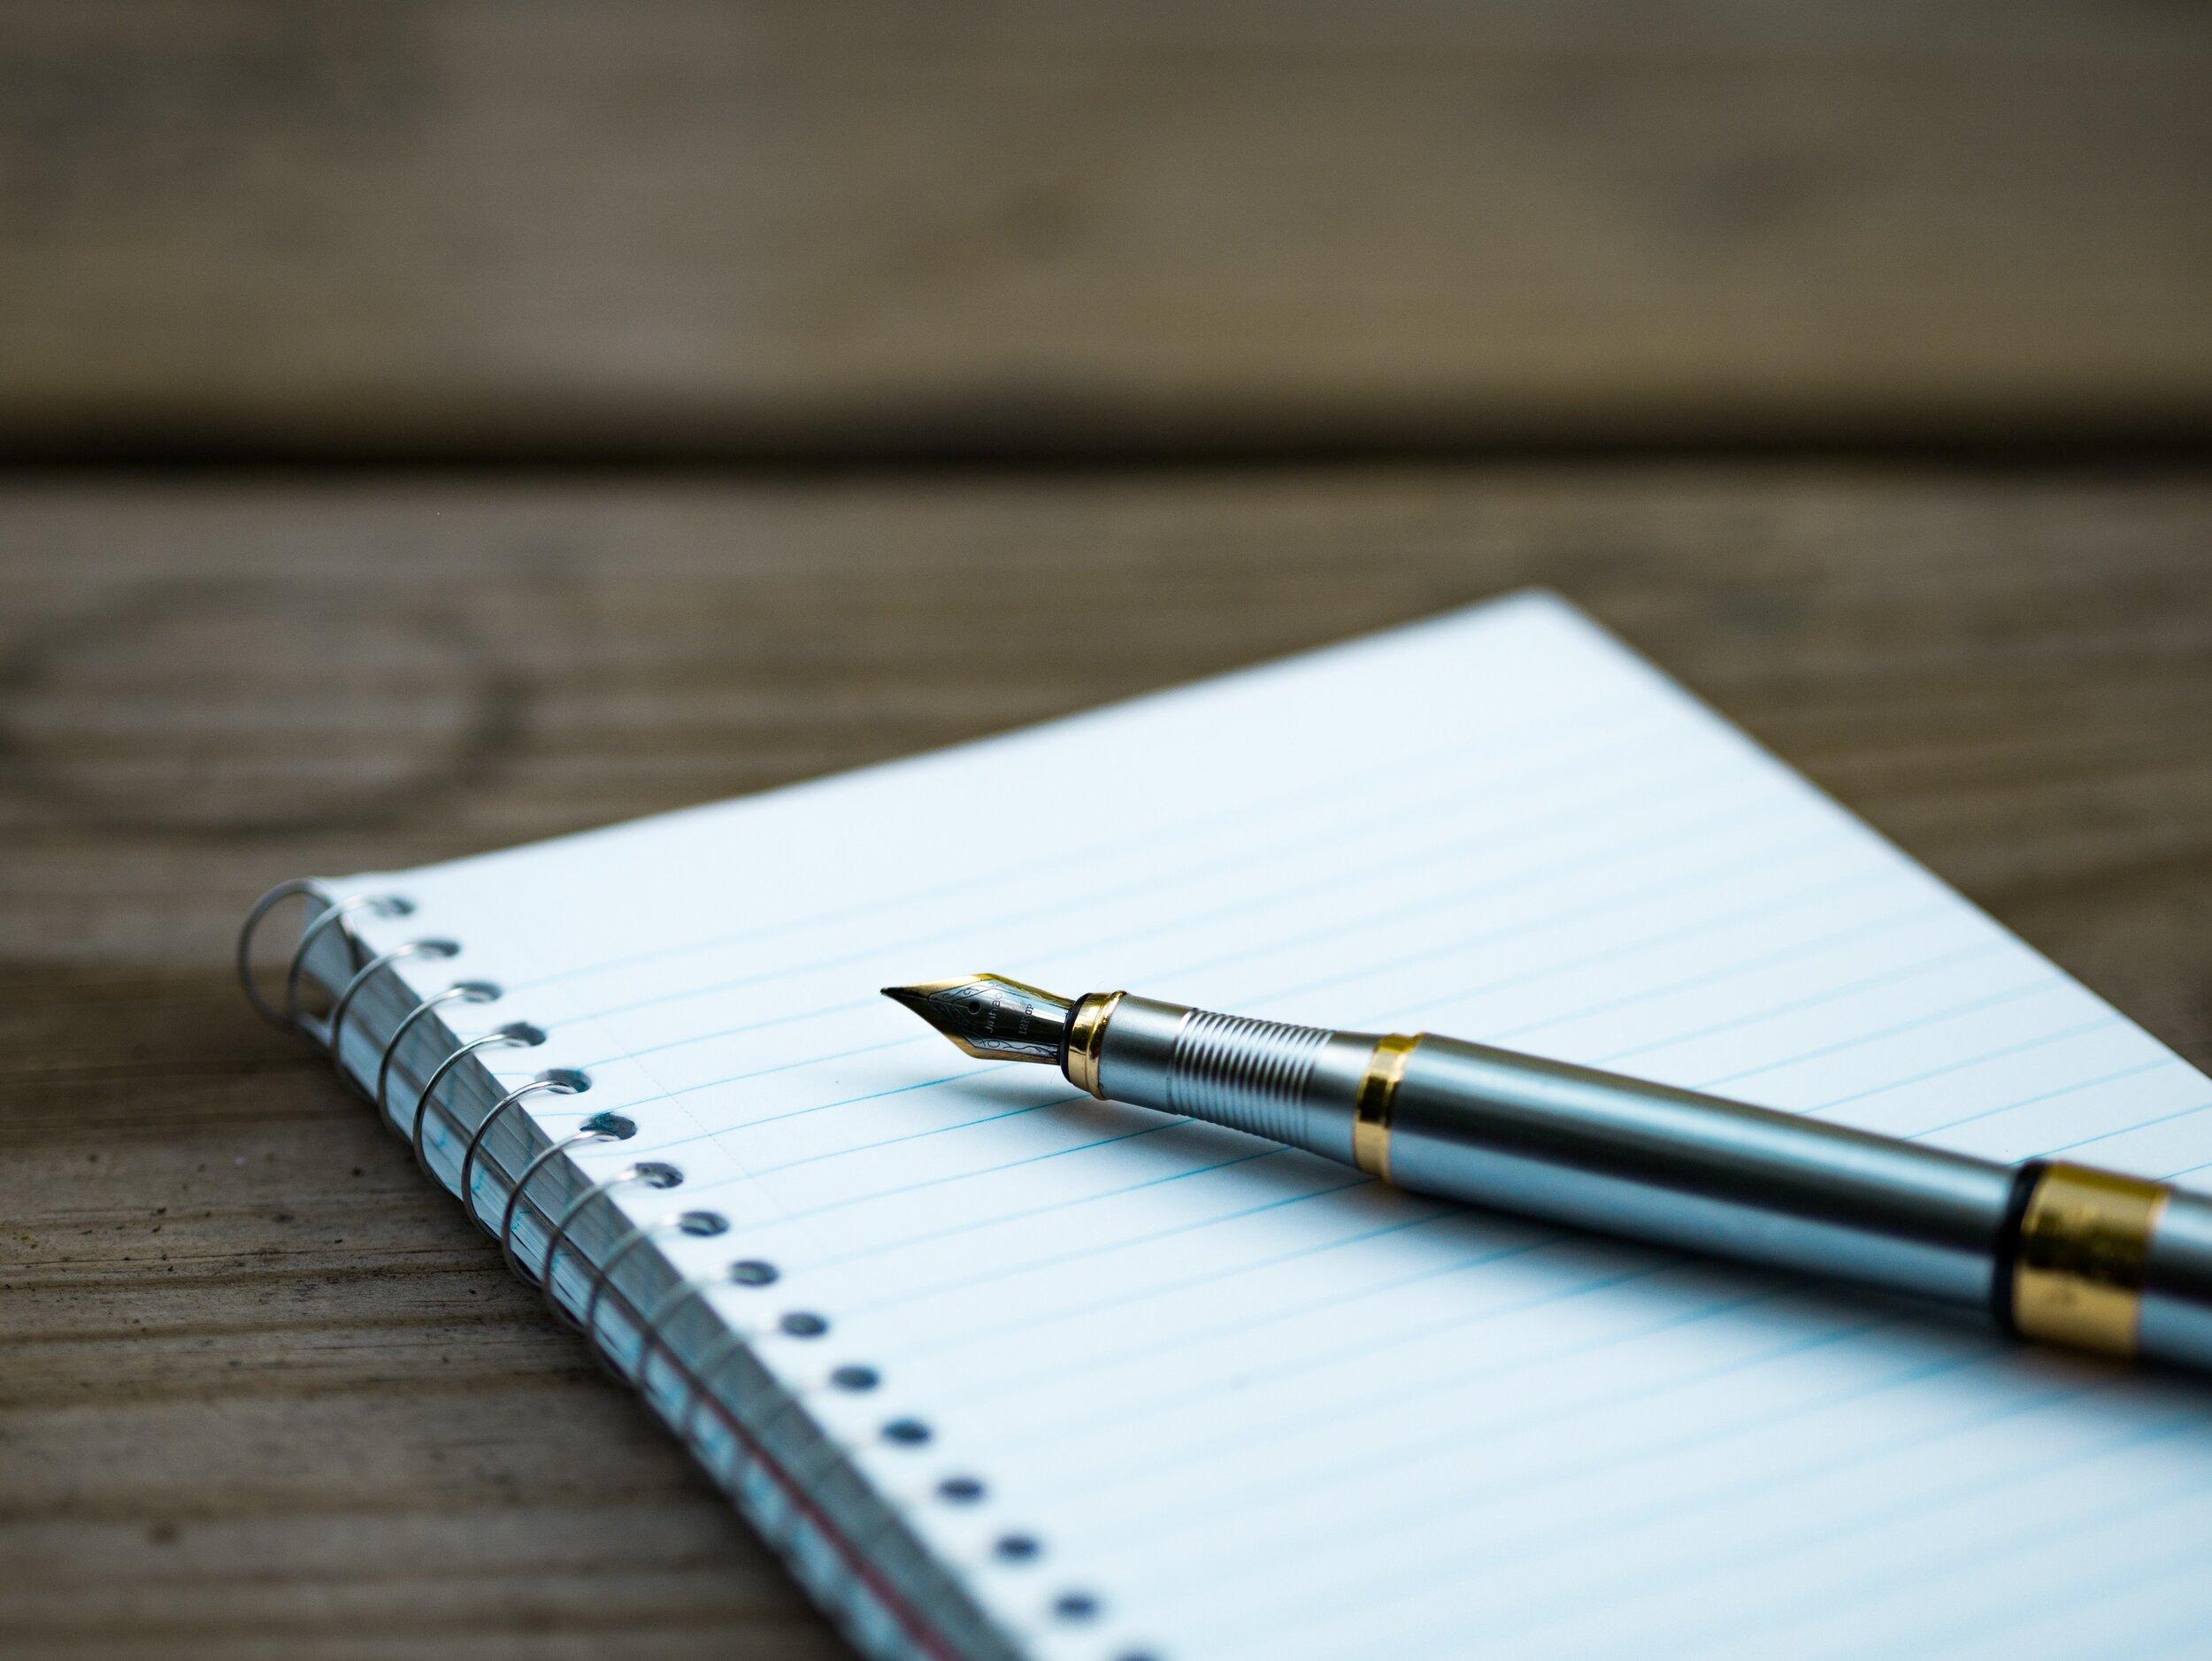 Image Description: A notepad with a pen on a wooden desk